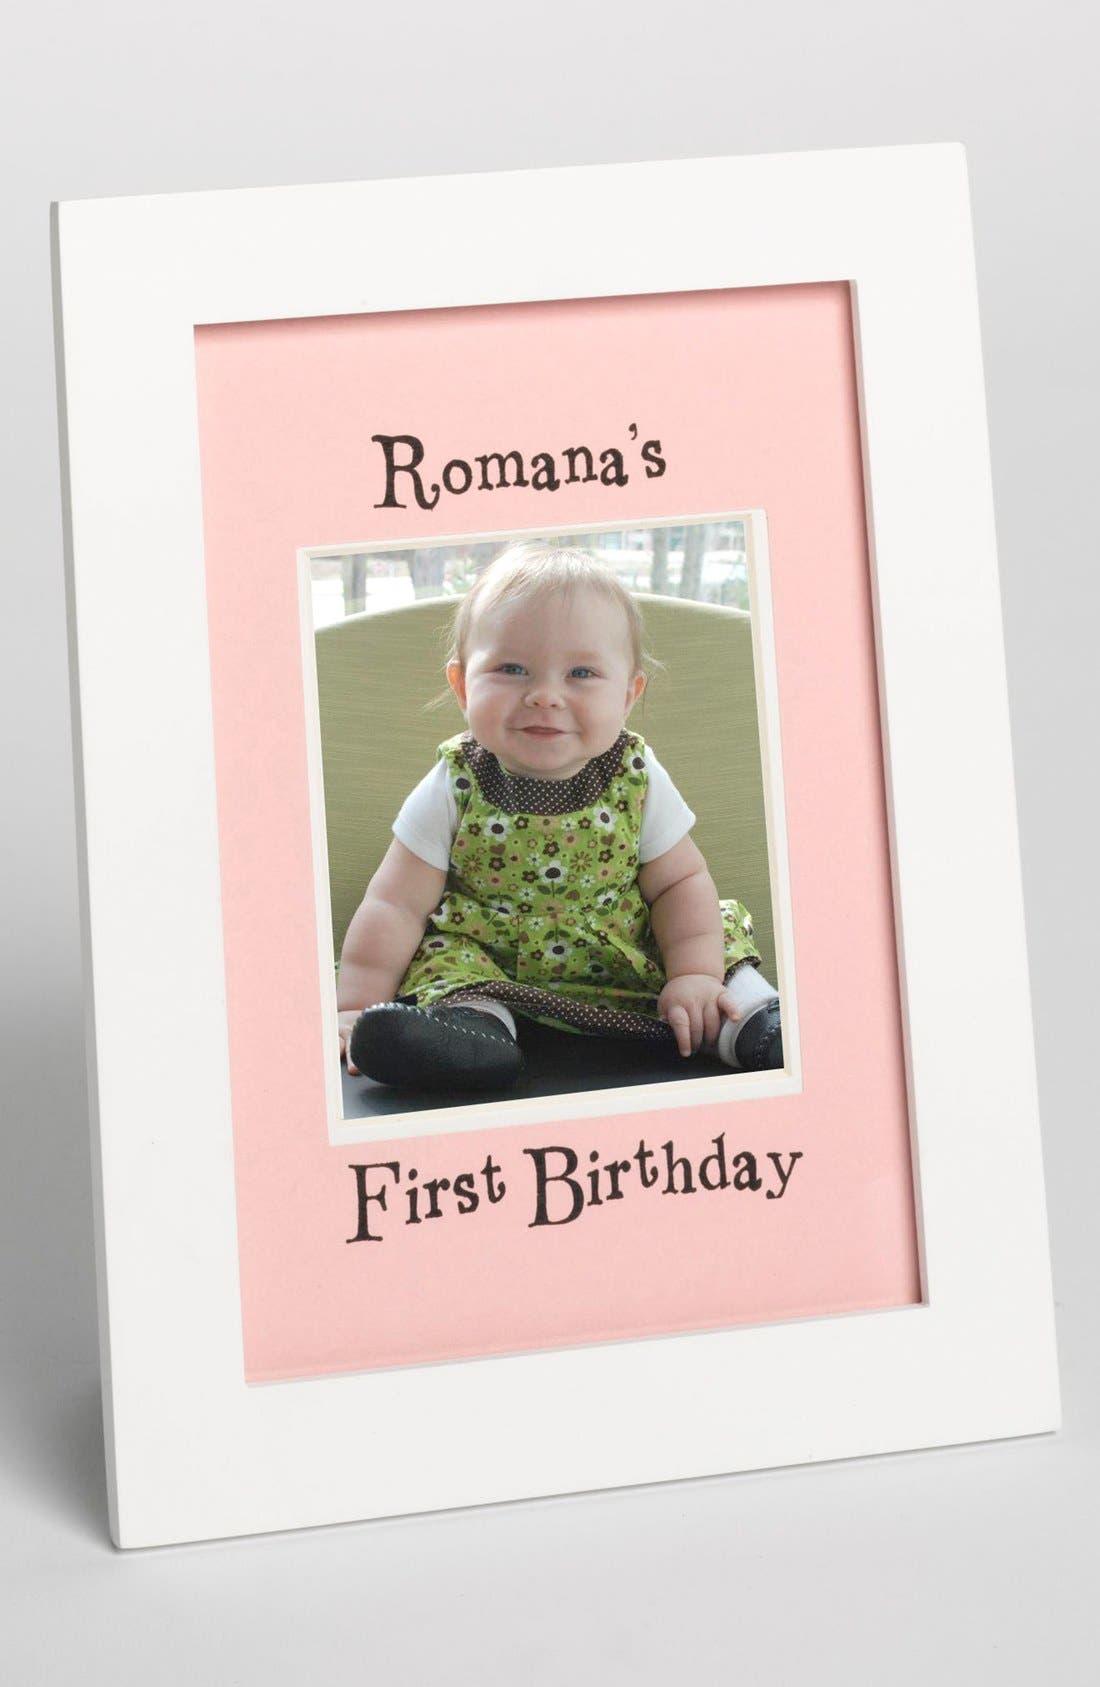 Main Image - FRAME PINK FIRST BIRTHDAY